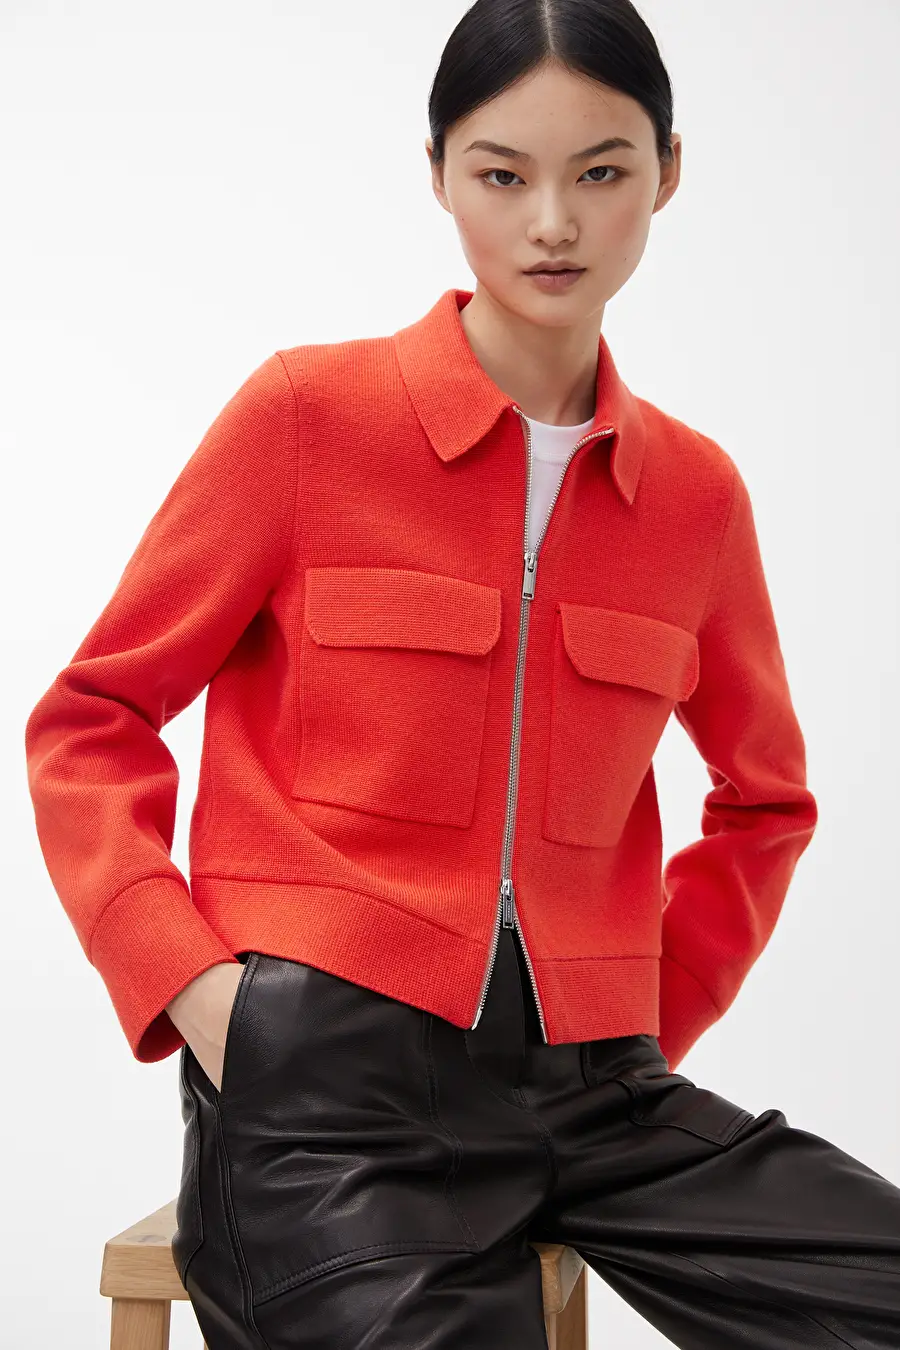 Merino Cotton Box Jacket Red Knitwear Arket Be Jackets Arket Cotton Box